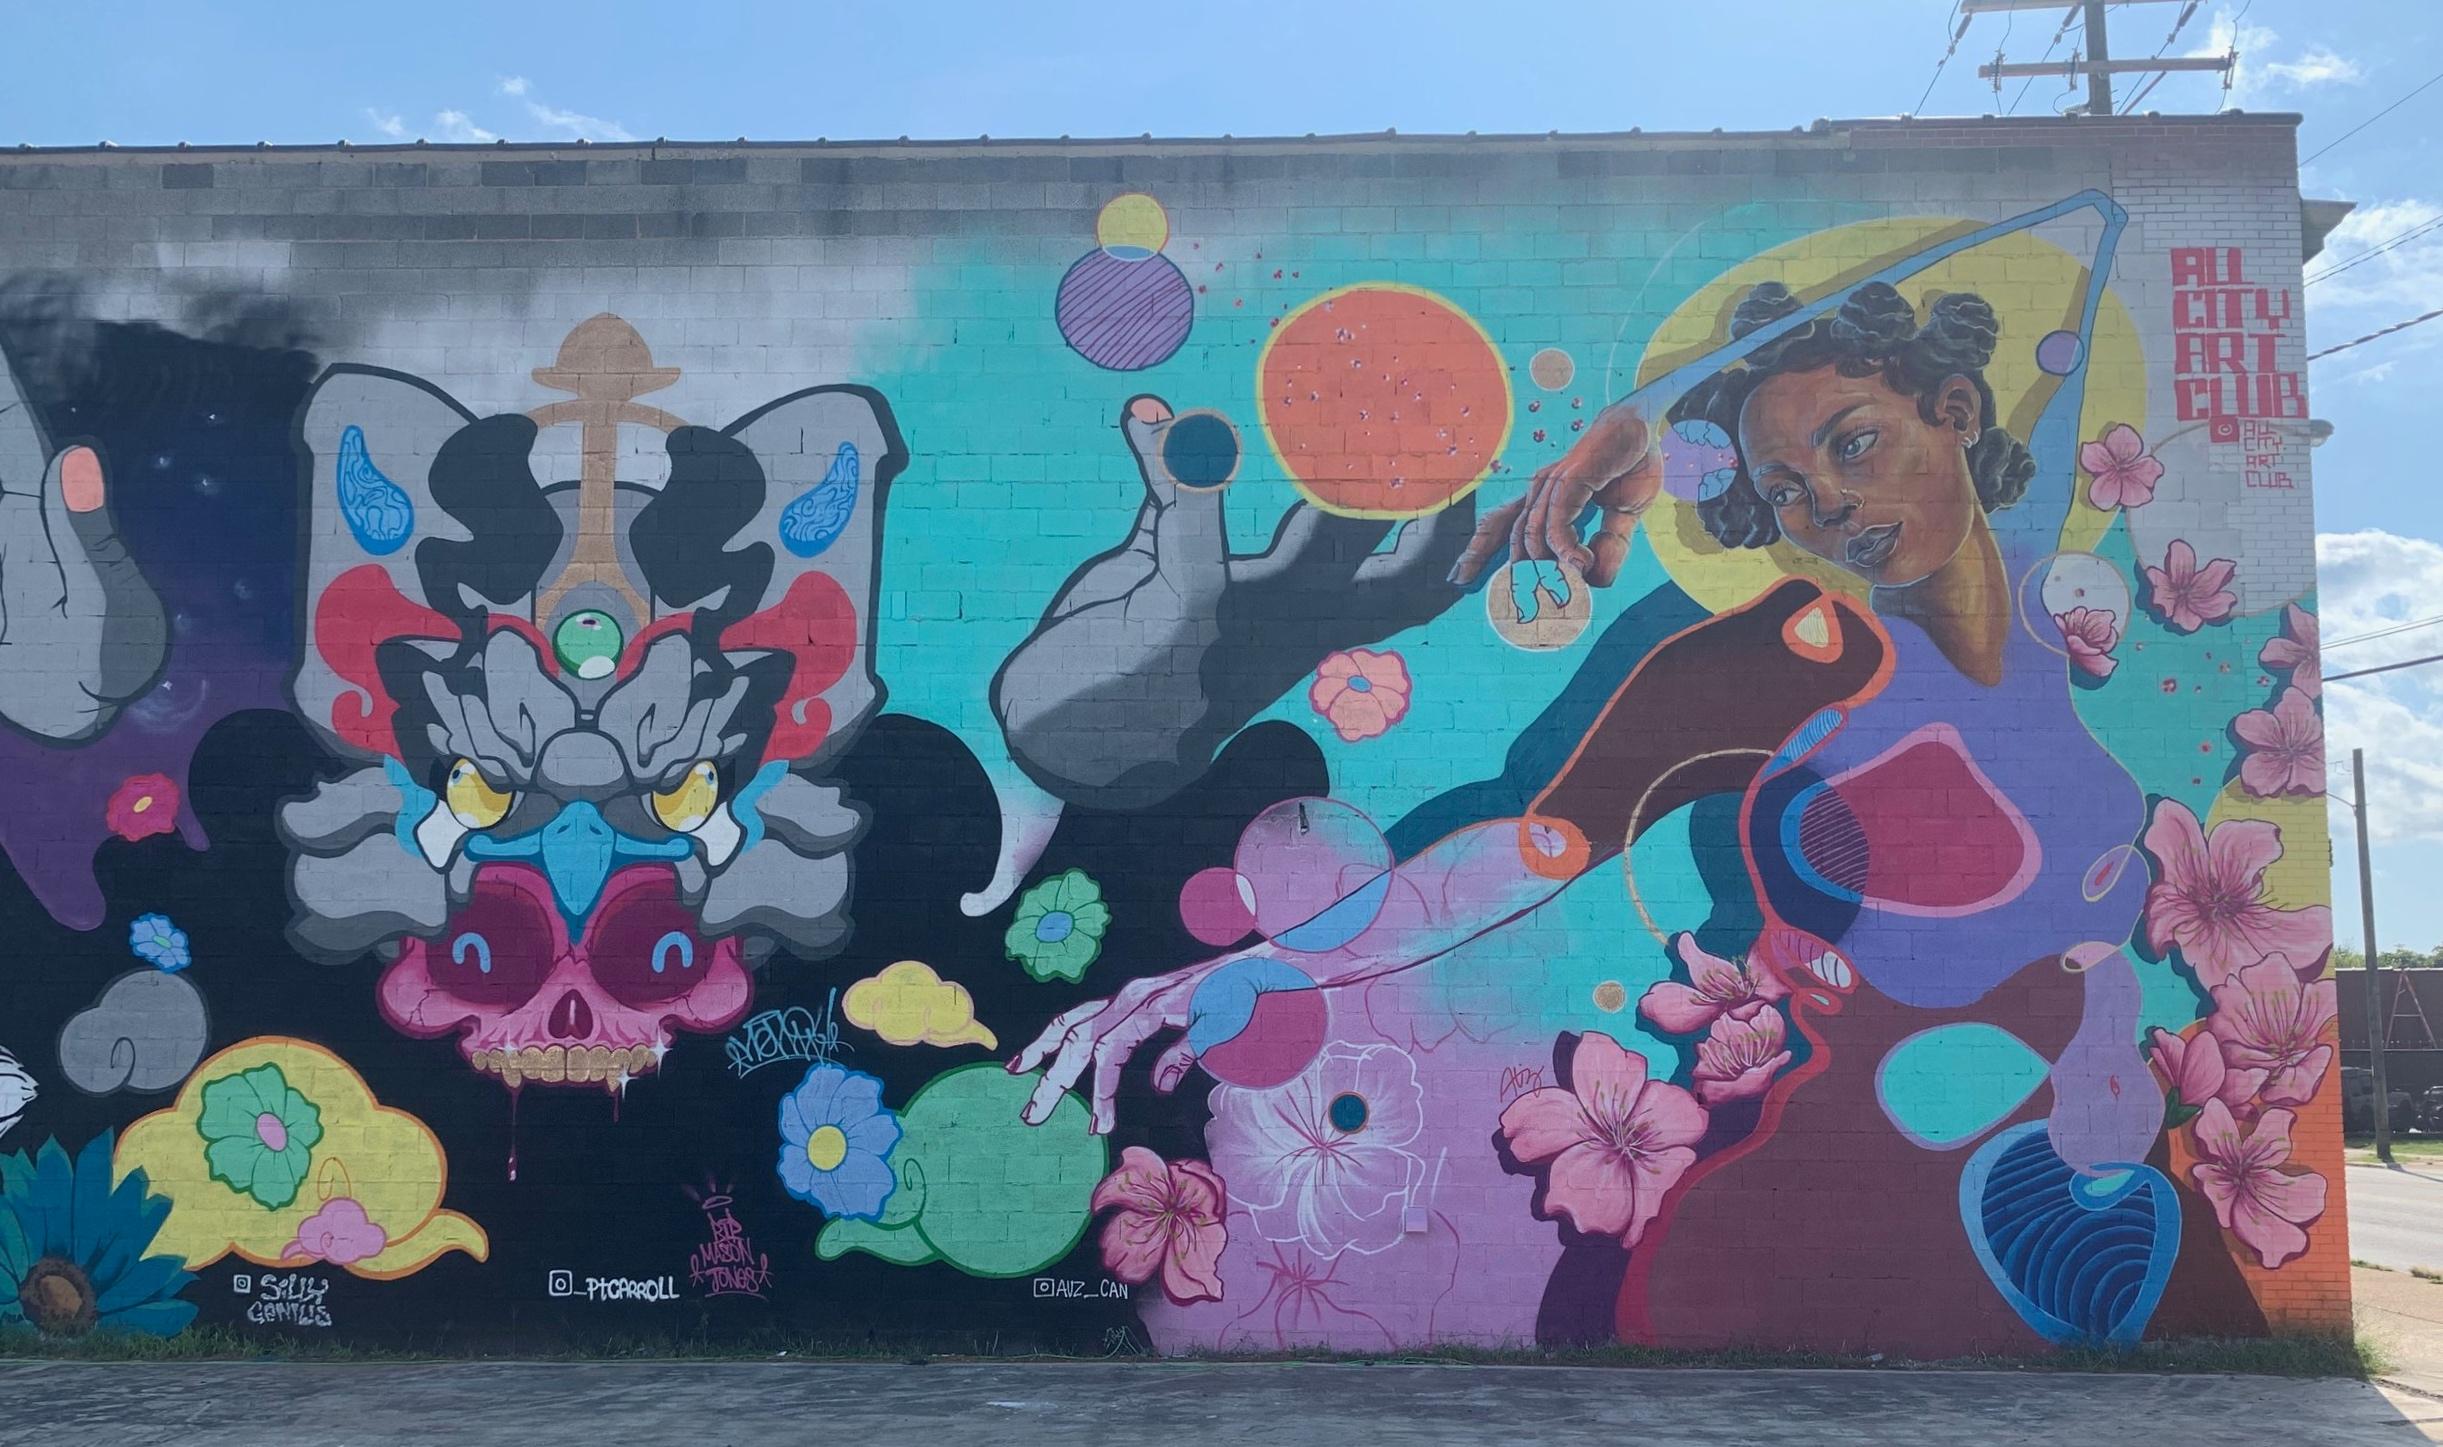 All City Art Club Mural at Blue Dot Studios Richmond, Virginia - BlackBelt Jones x Austin Auz Miles